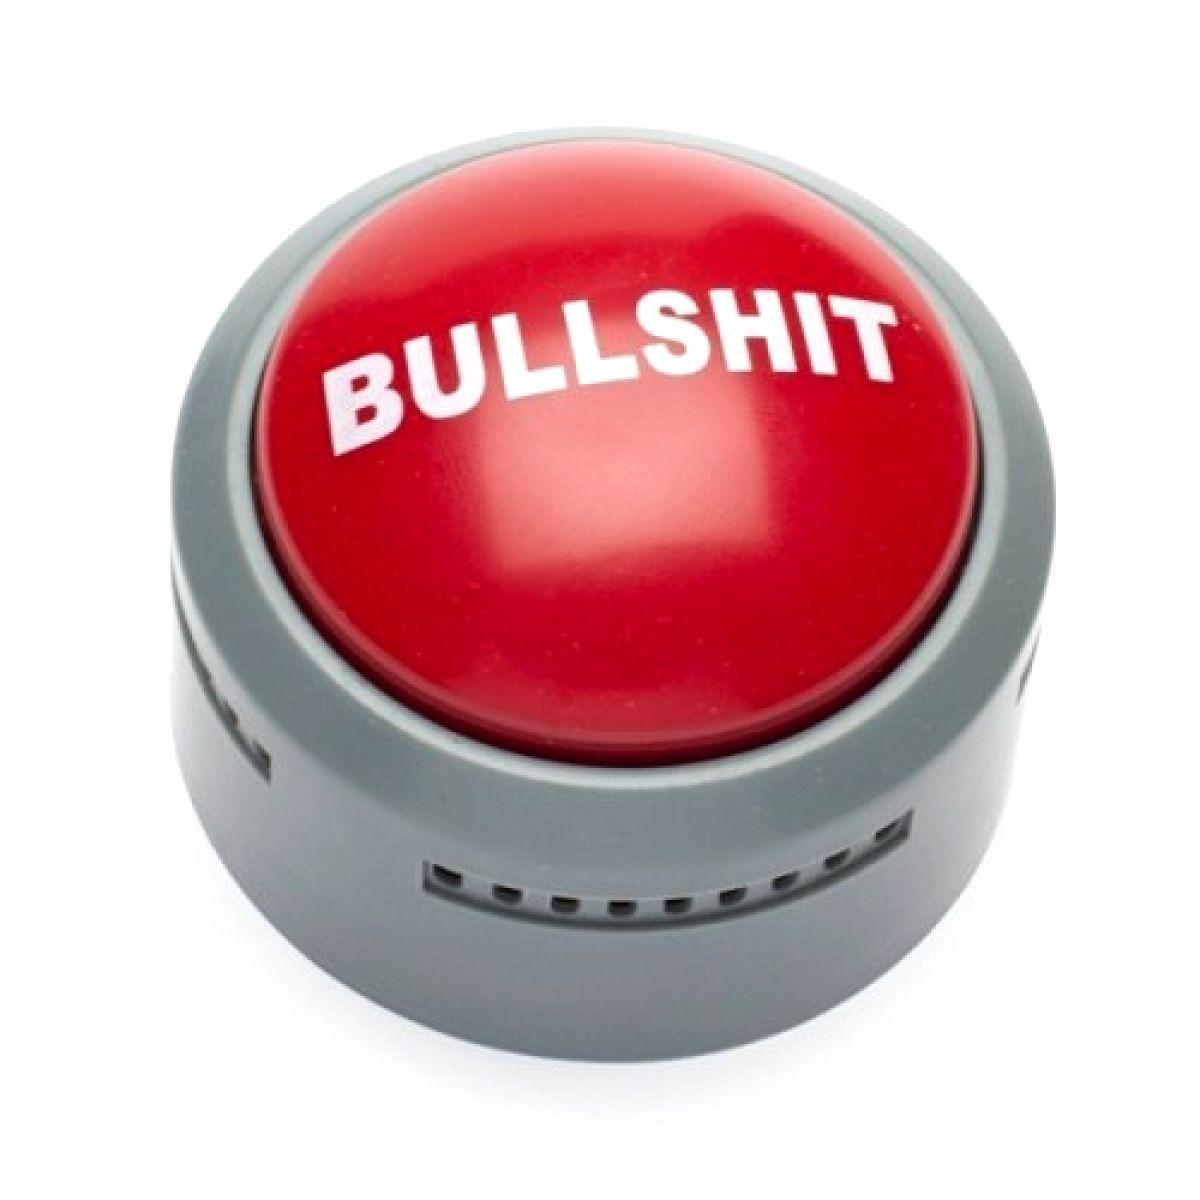 Bullshit Button, Sound Button, Office Toys, Funny Office